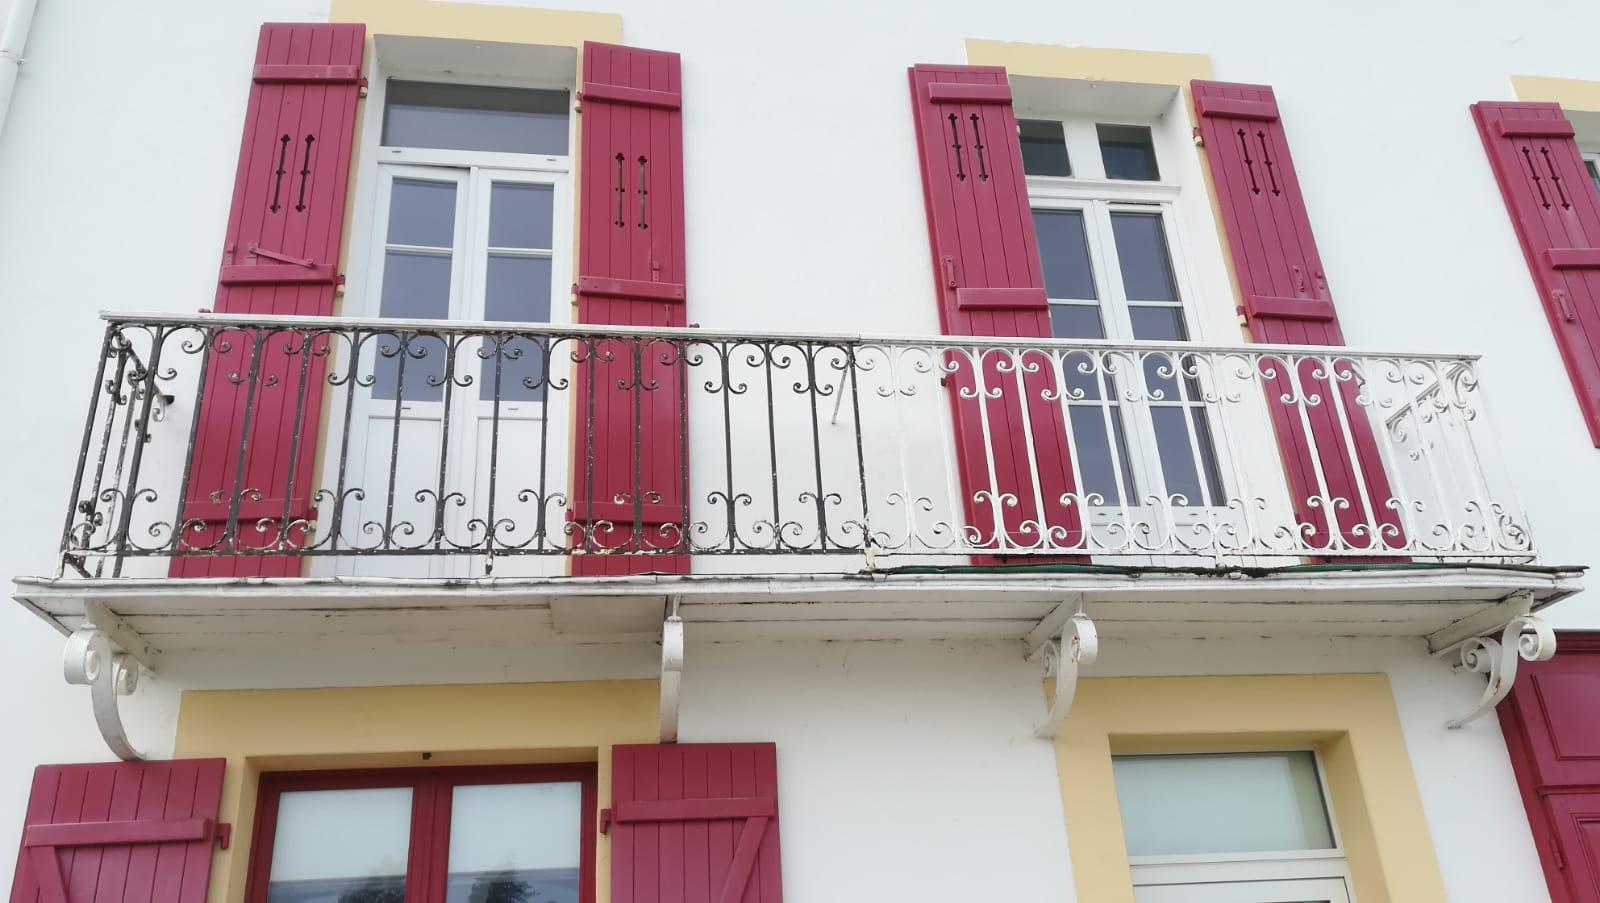 Maison de bord de mer (Sauzon - Belle Ile en Mer) : expertise balcon ancien (fer forgé + bois)